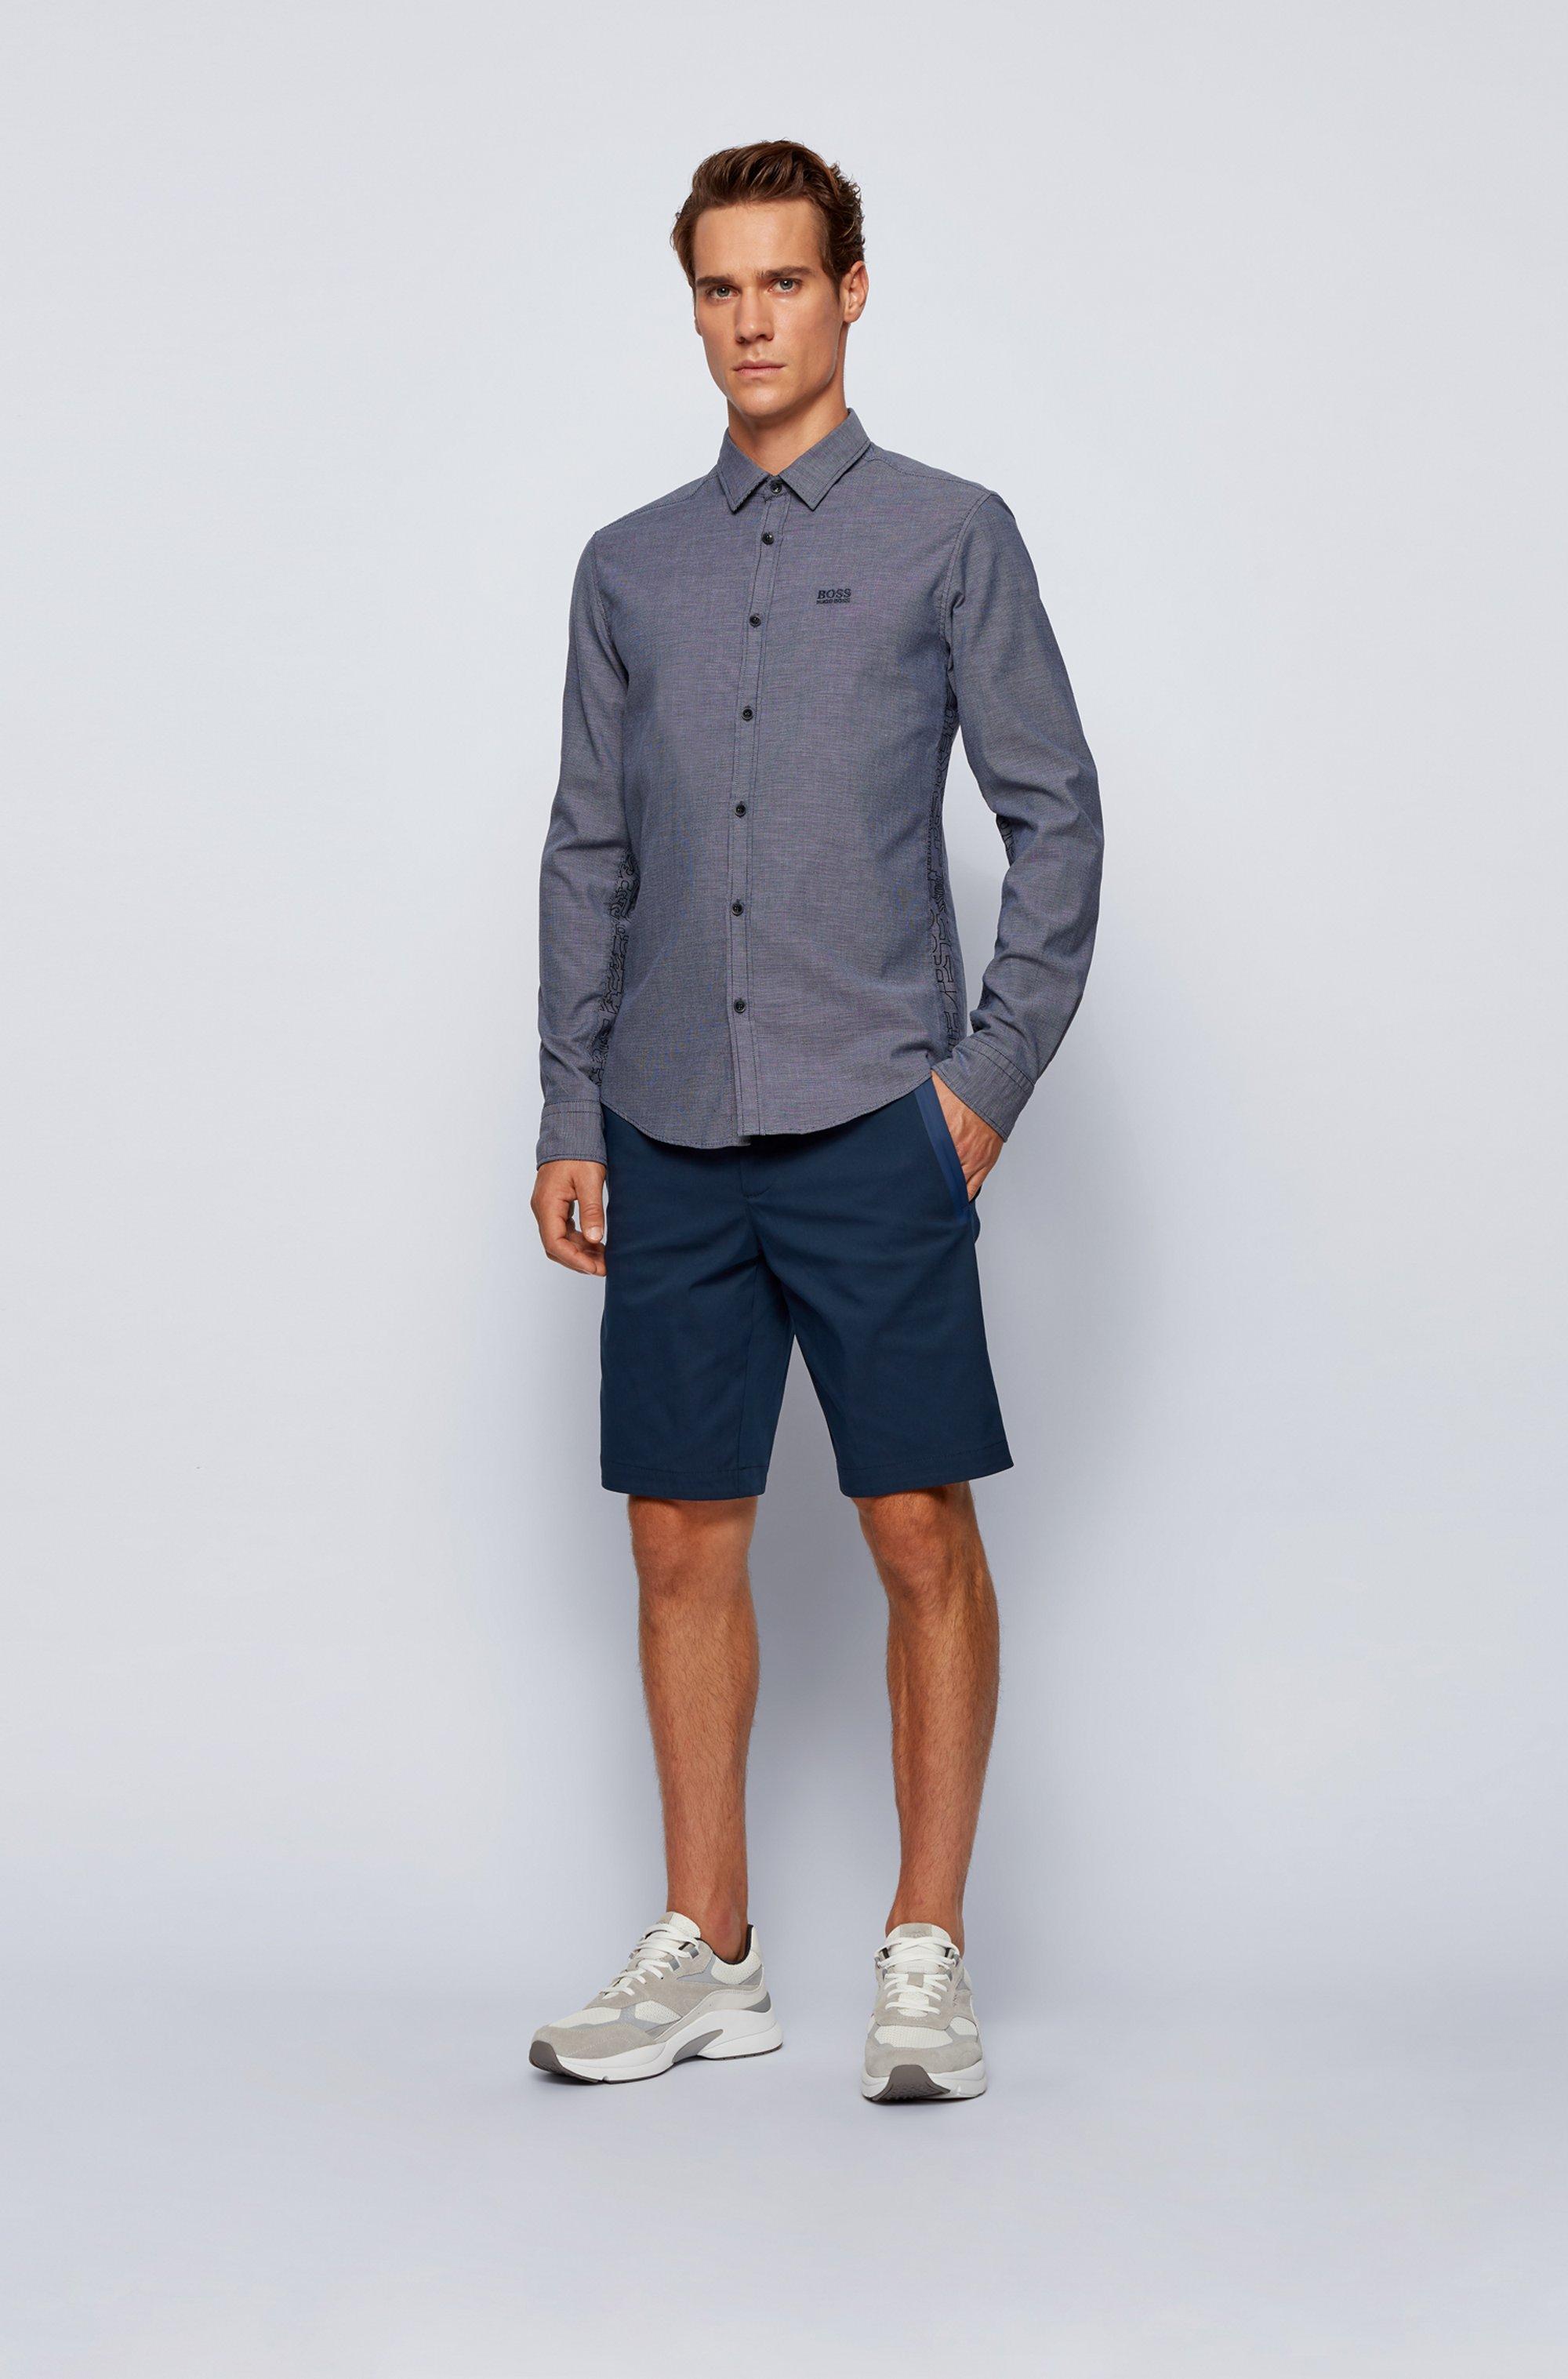 Slim-fit Oxfordoverhemd met contrasterende logoprints